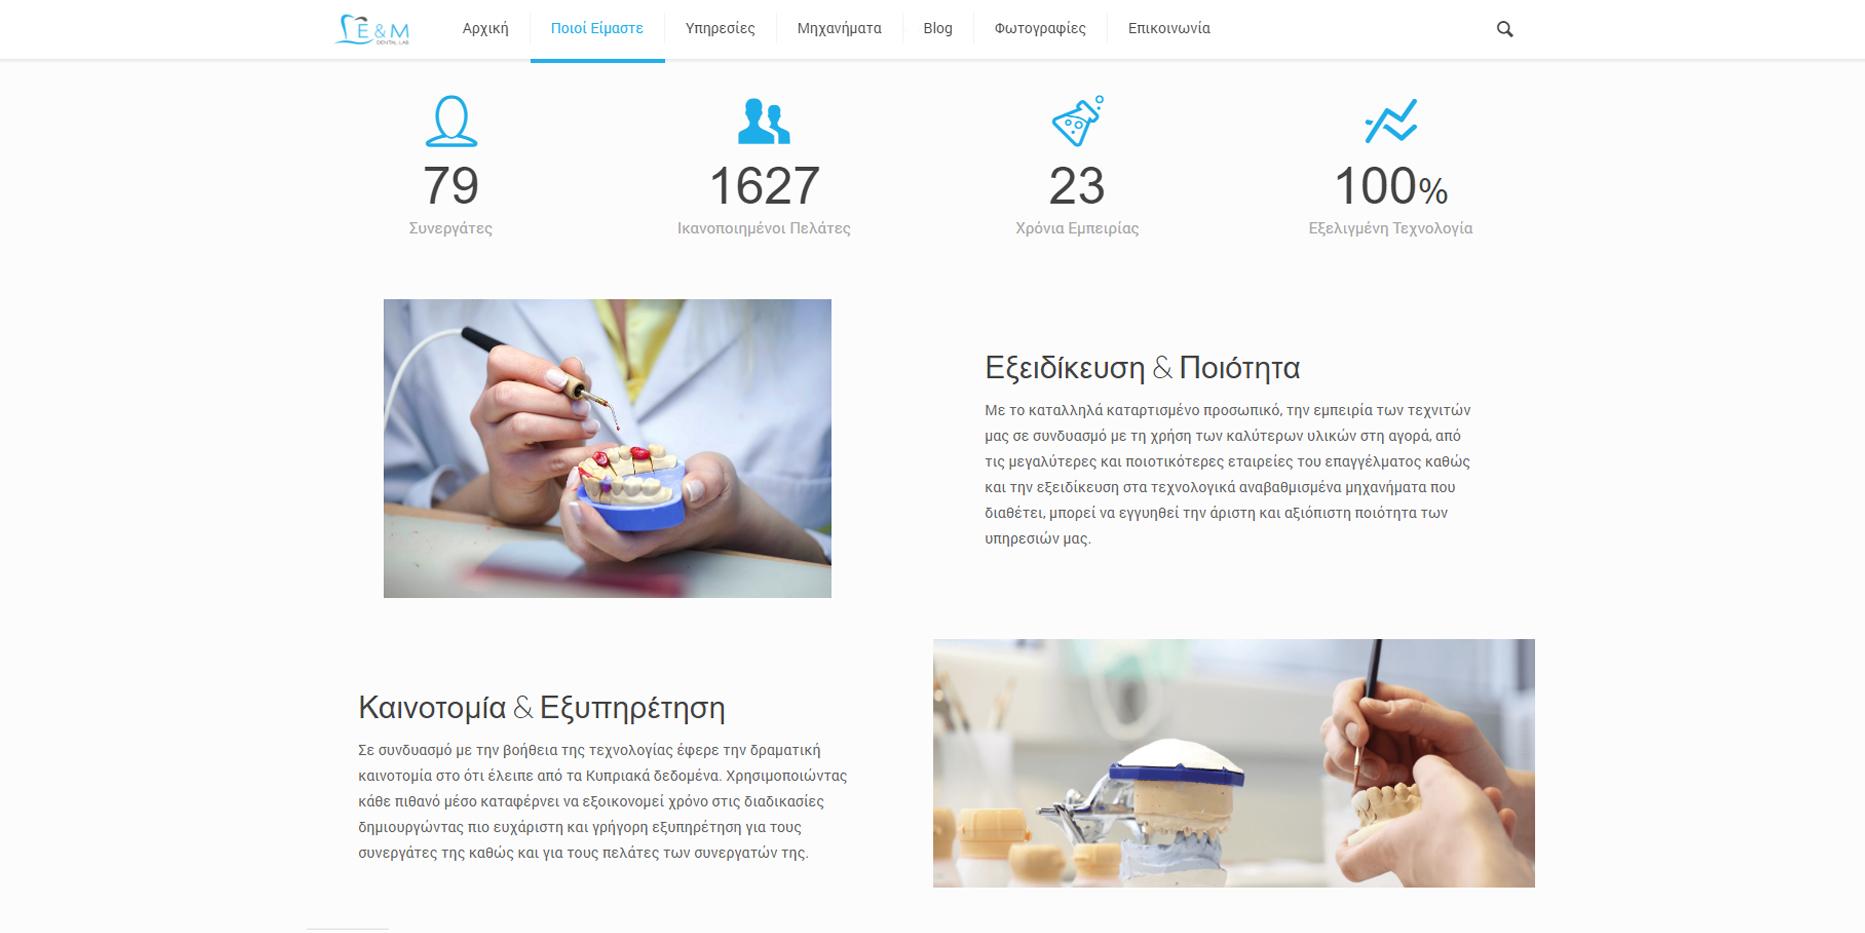 iCreate Web Design | Web Design | E&M Dental Lab